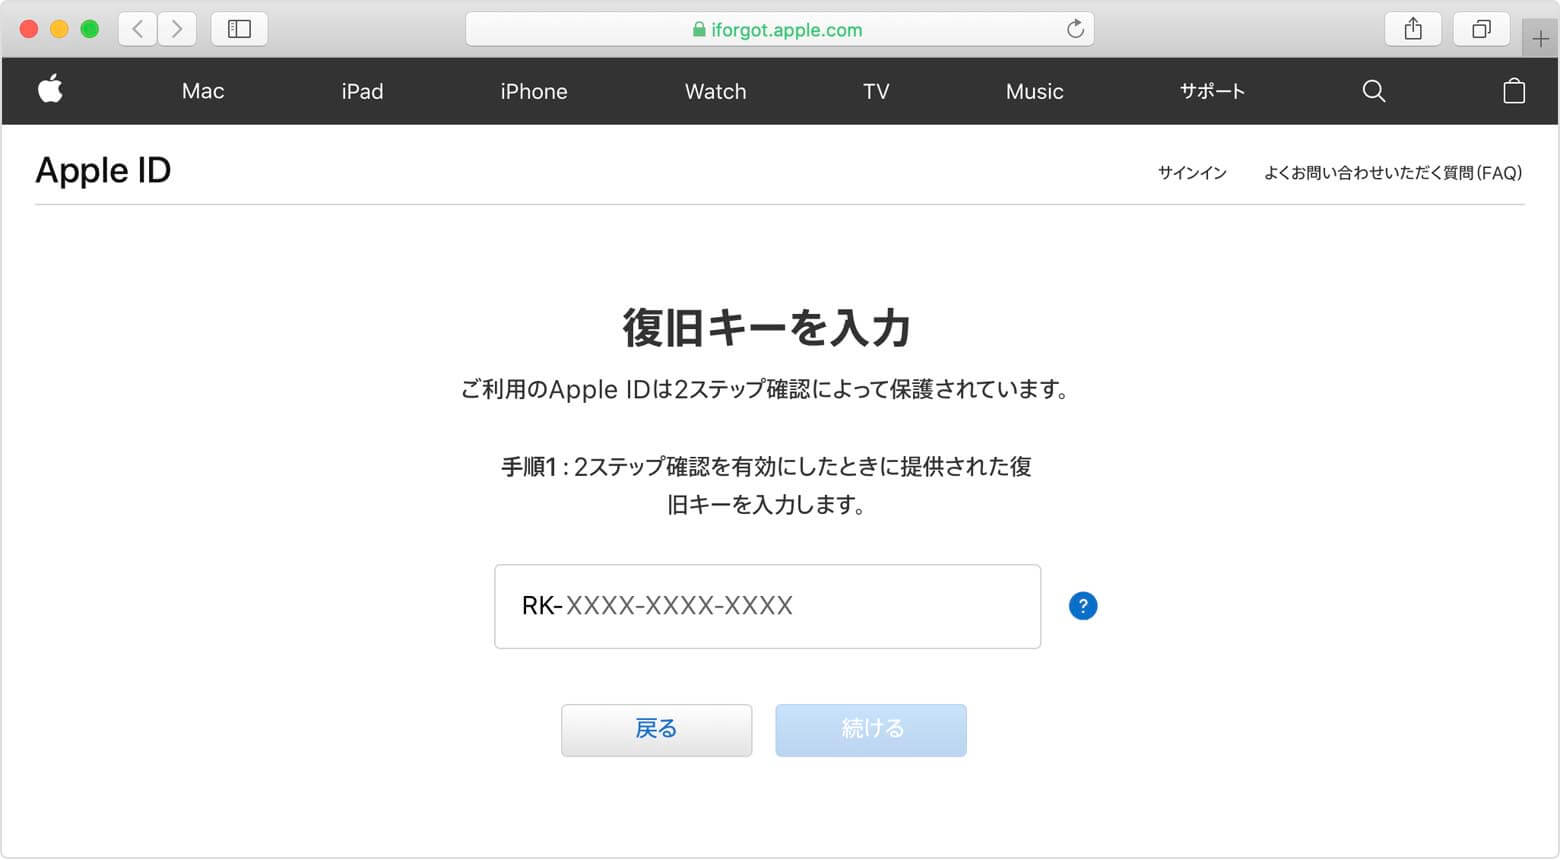 AppleID 復旧キー入力